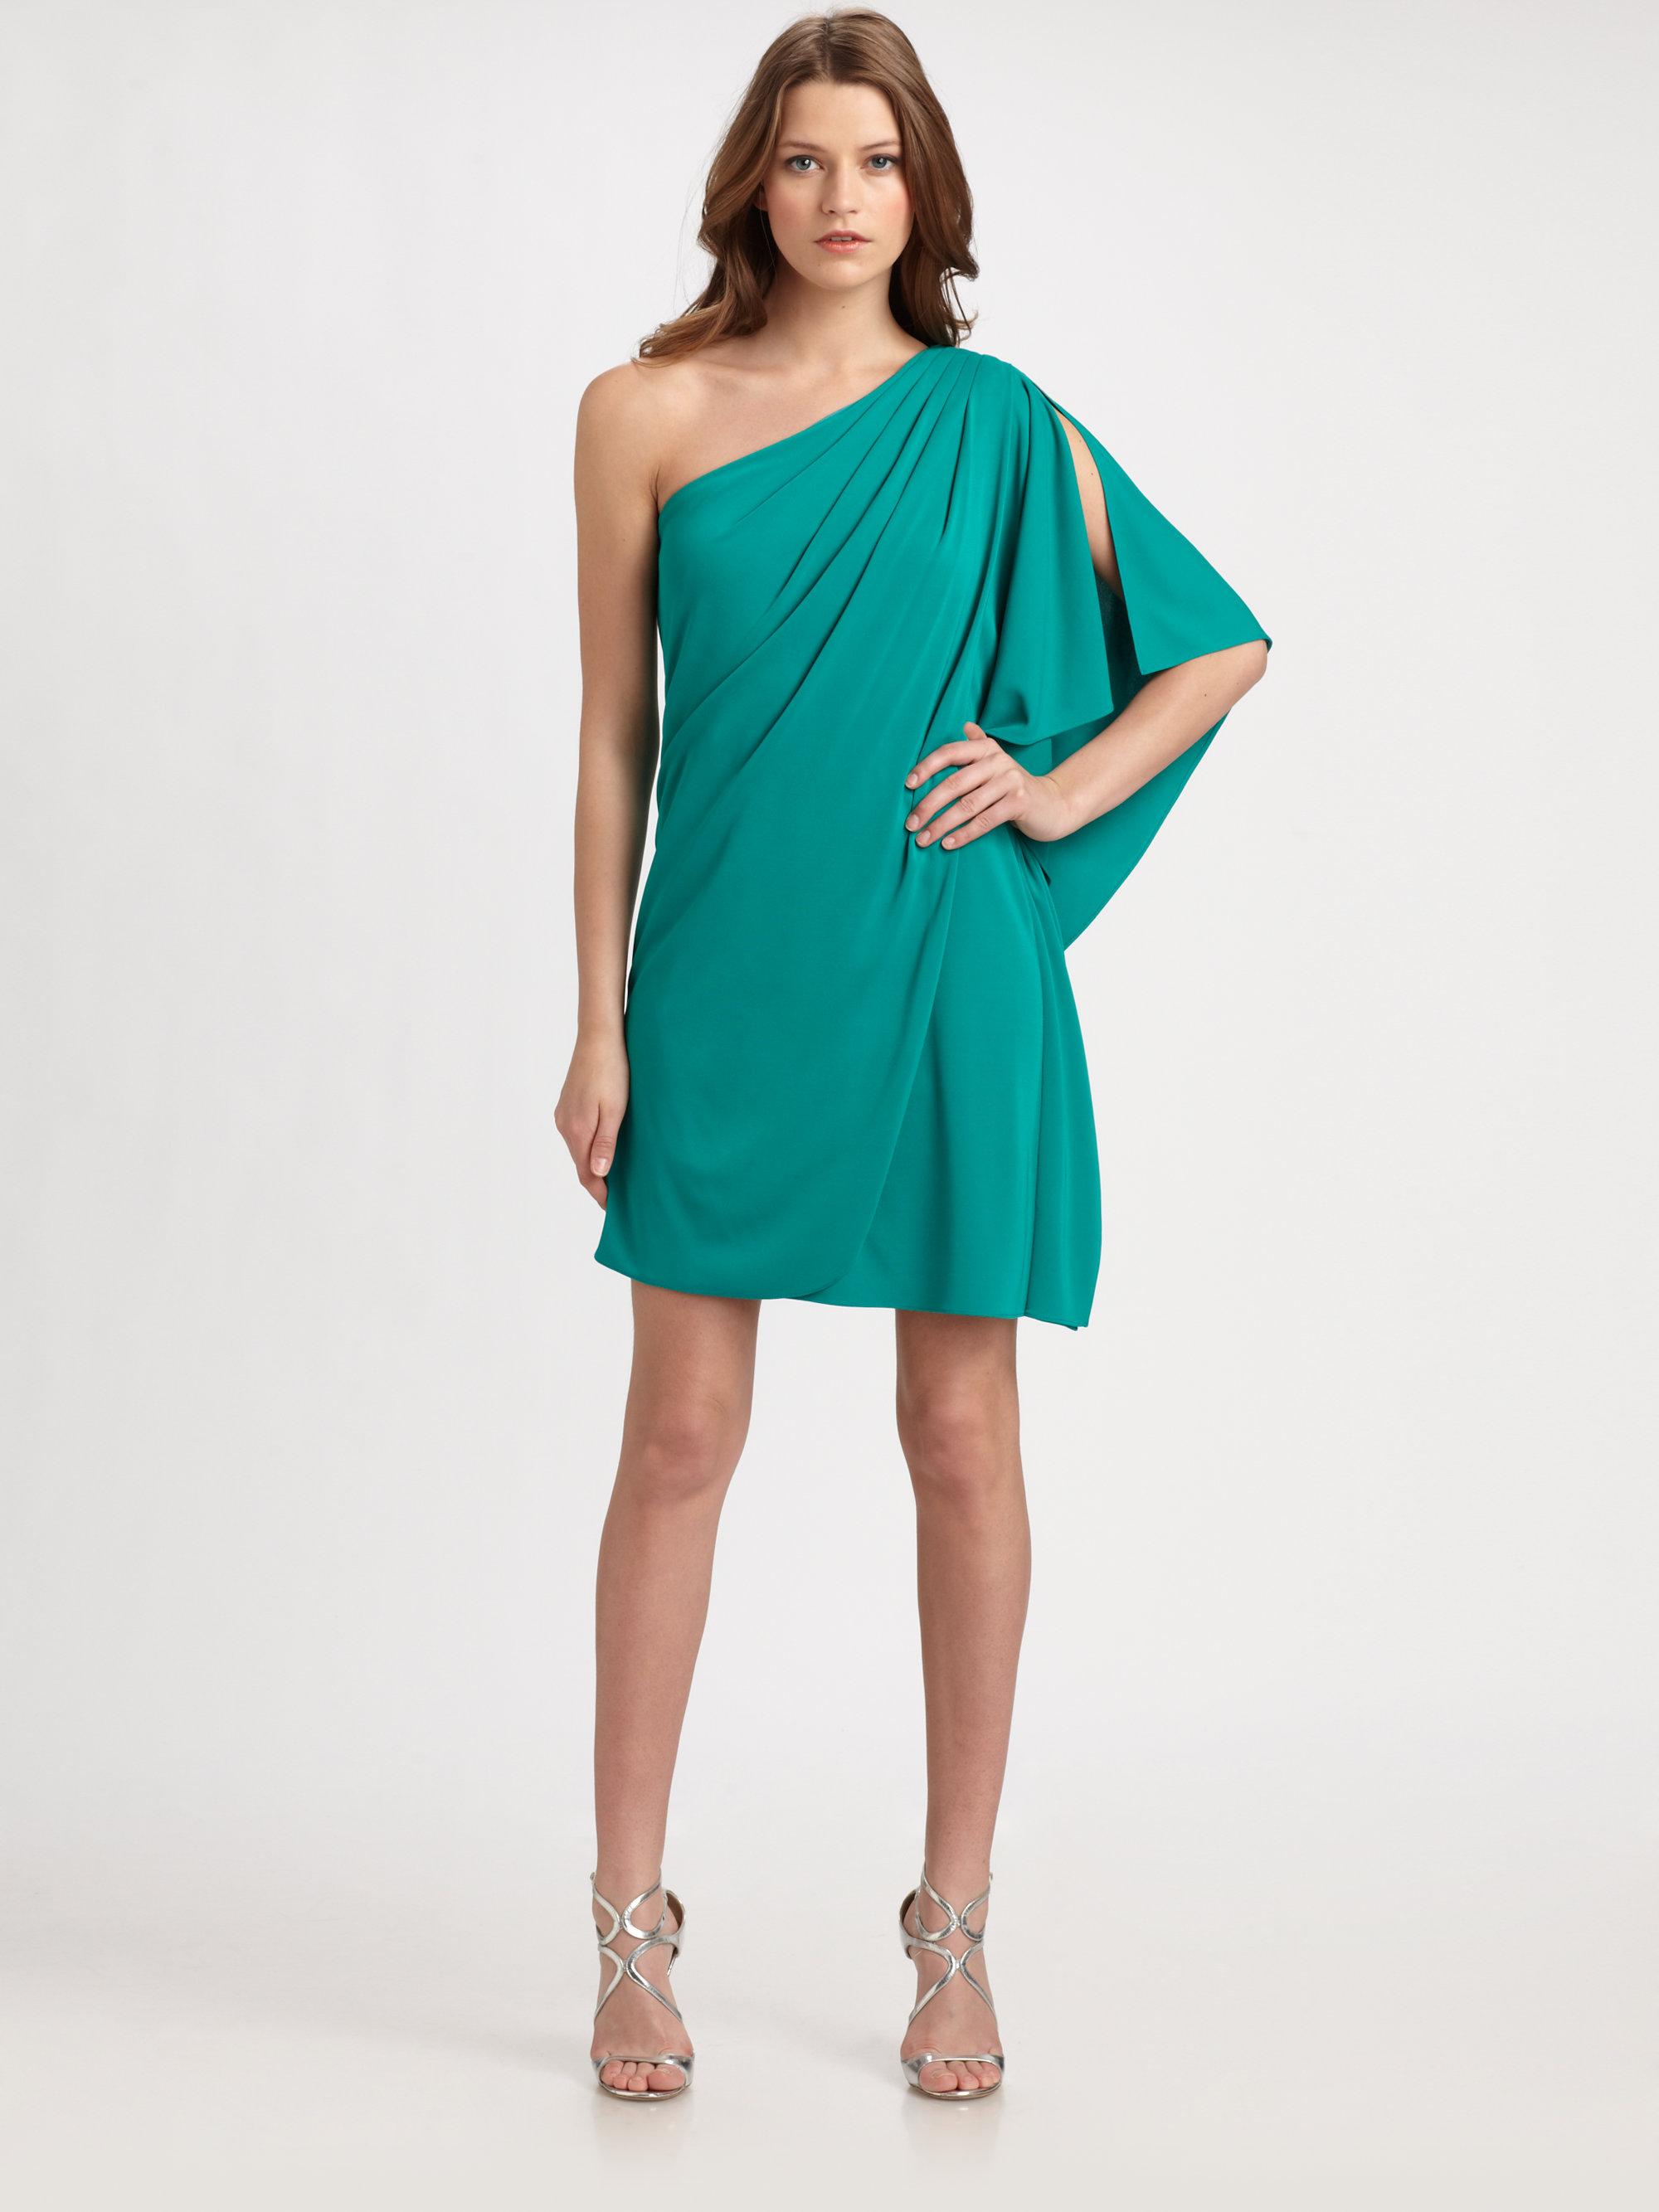 Lyst Badgley Mischka One Shoulder Caftan Dress In Green